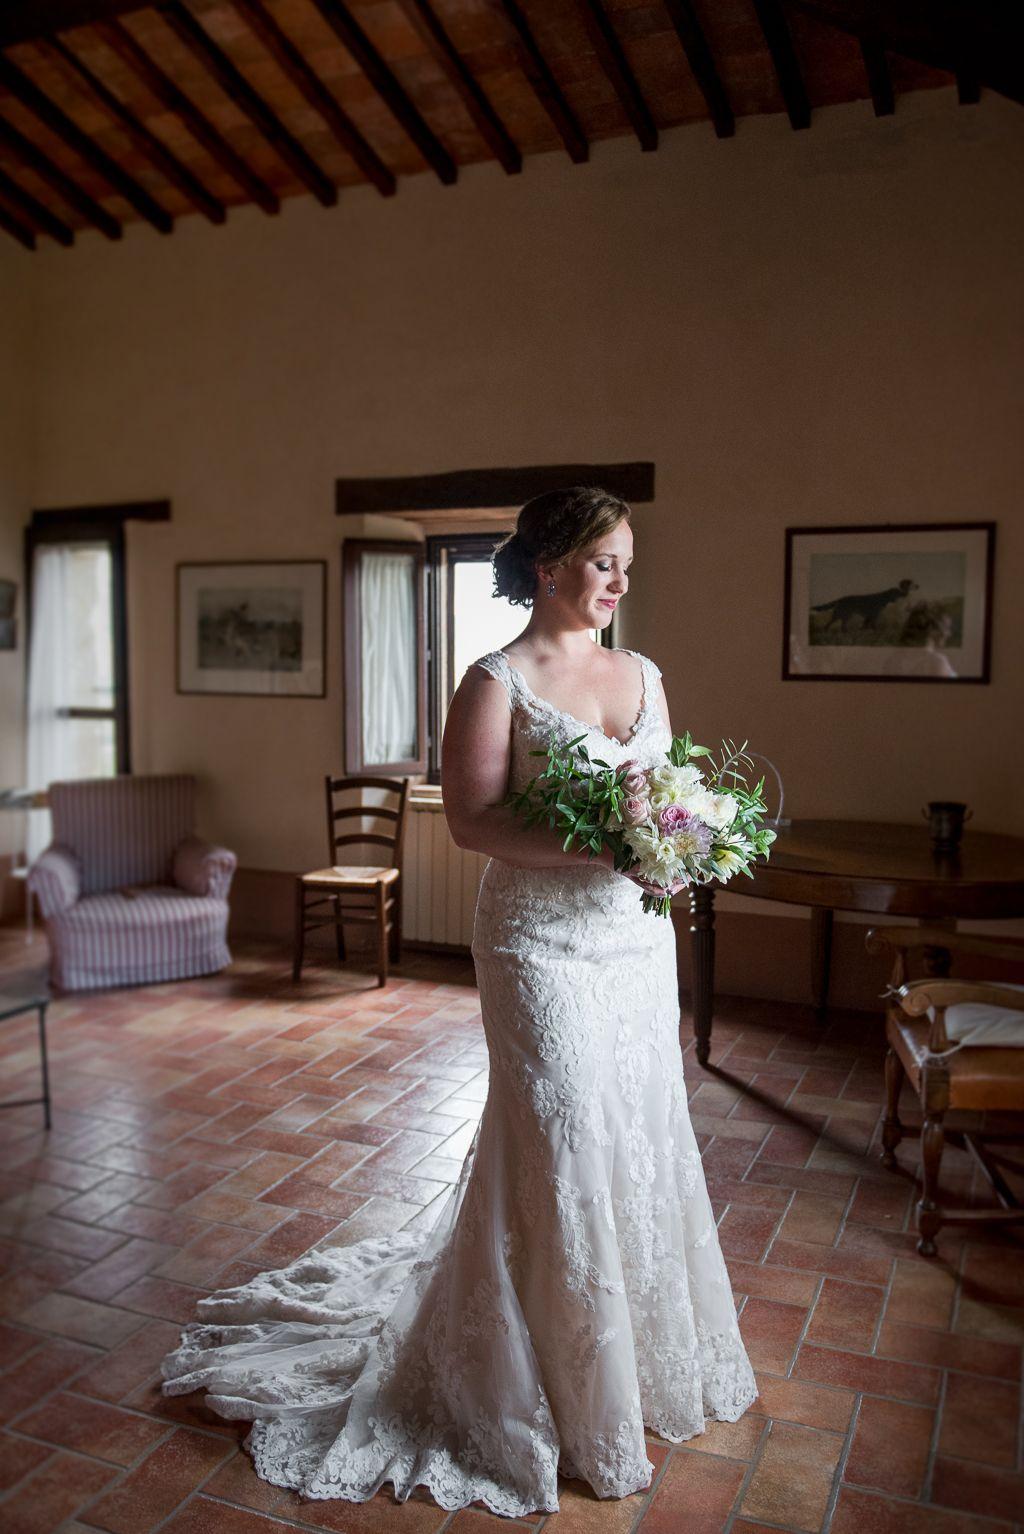 Borgo di Castelvecchio Wedding Photographer – Siena, Tuscany